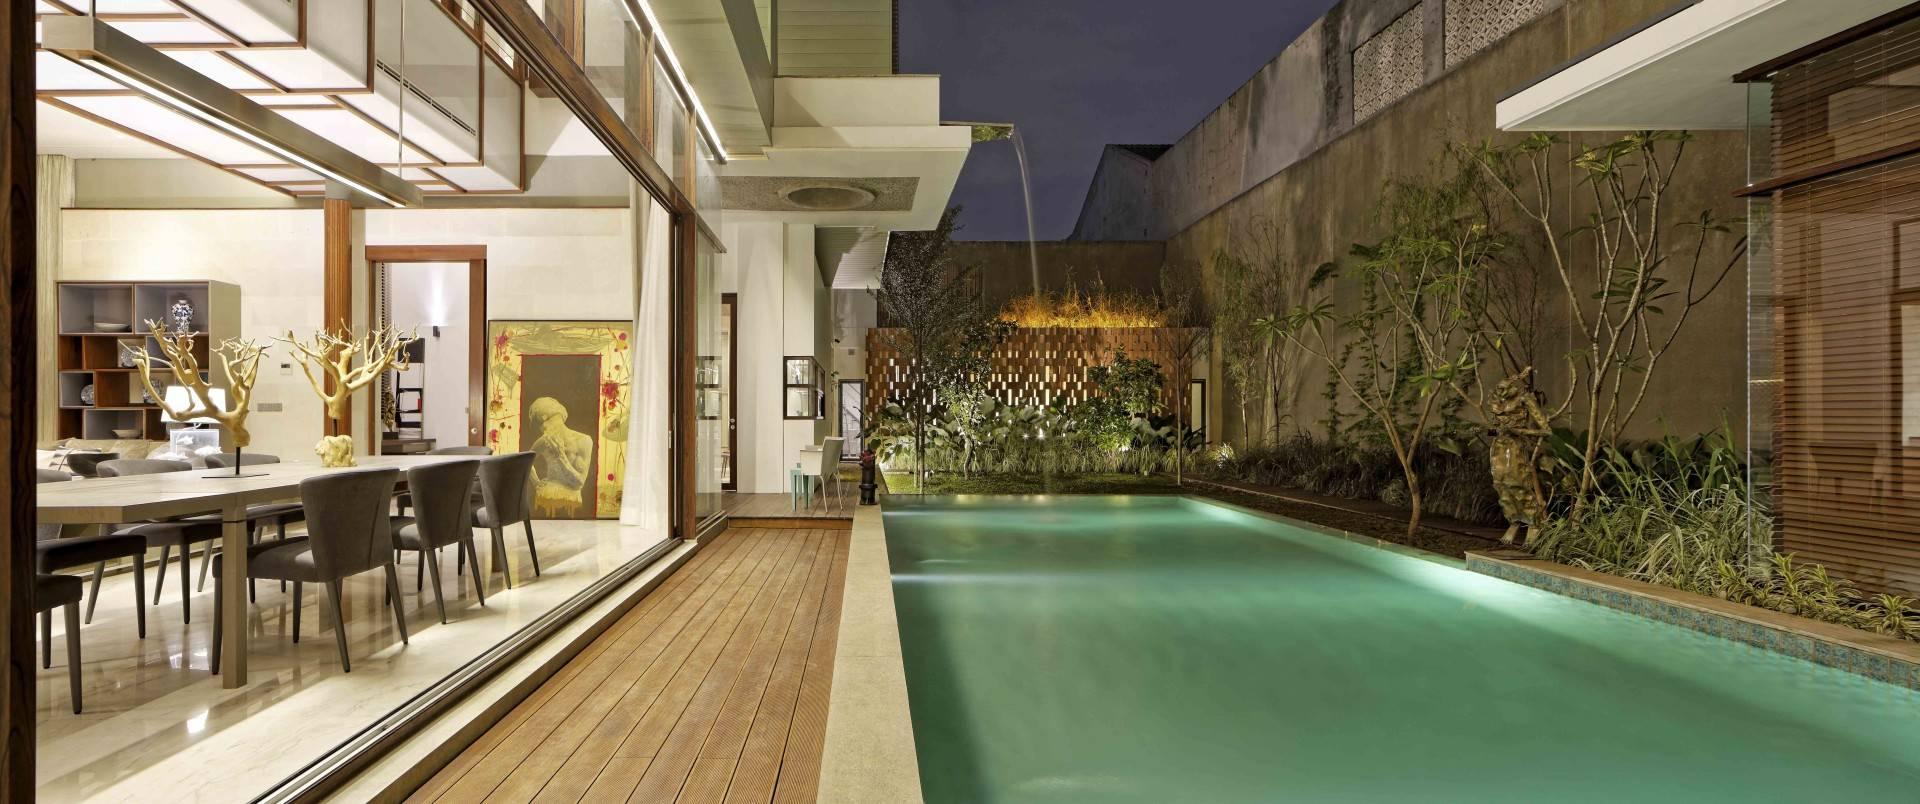 Atelier Cosmas Gozali Denpasar Residence At Kuningan Jakarta, Indonesia Jakarta, Indonesia Swimming Pool View  <P>Photo By Fernando Gomulya</p> 2277